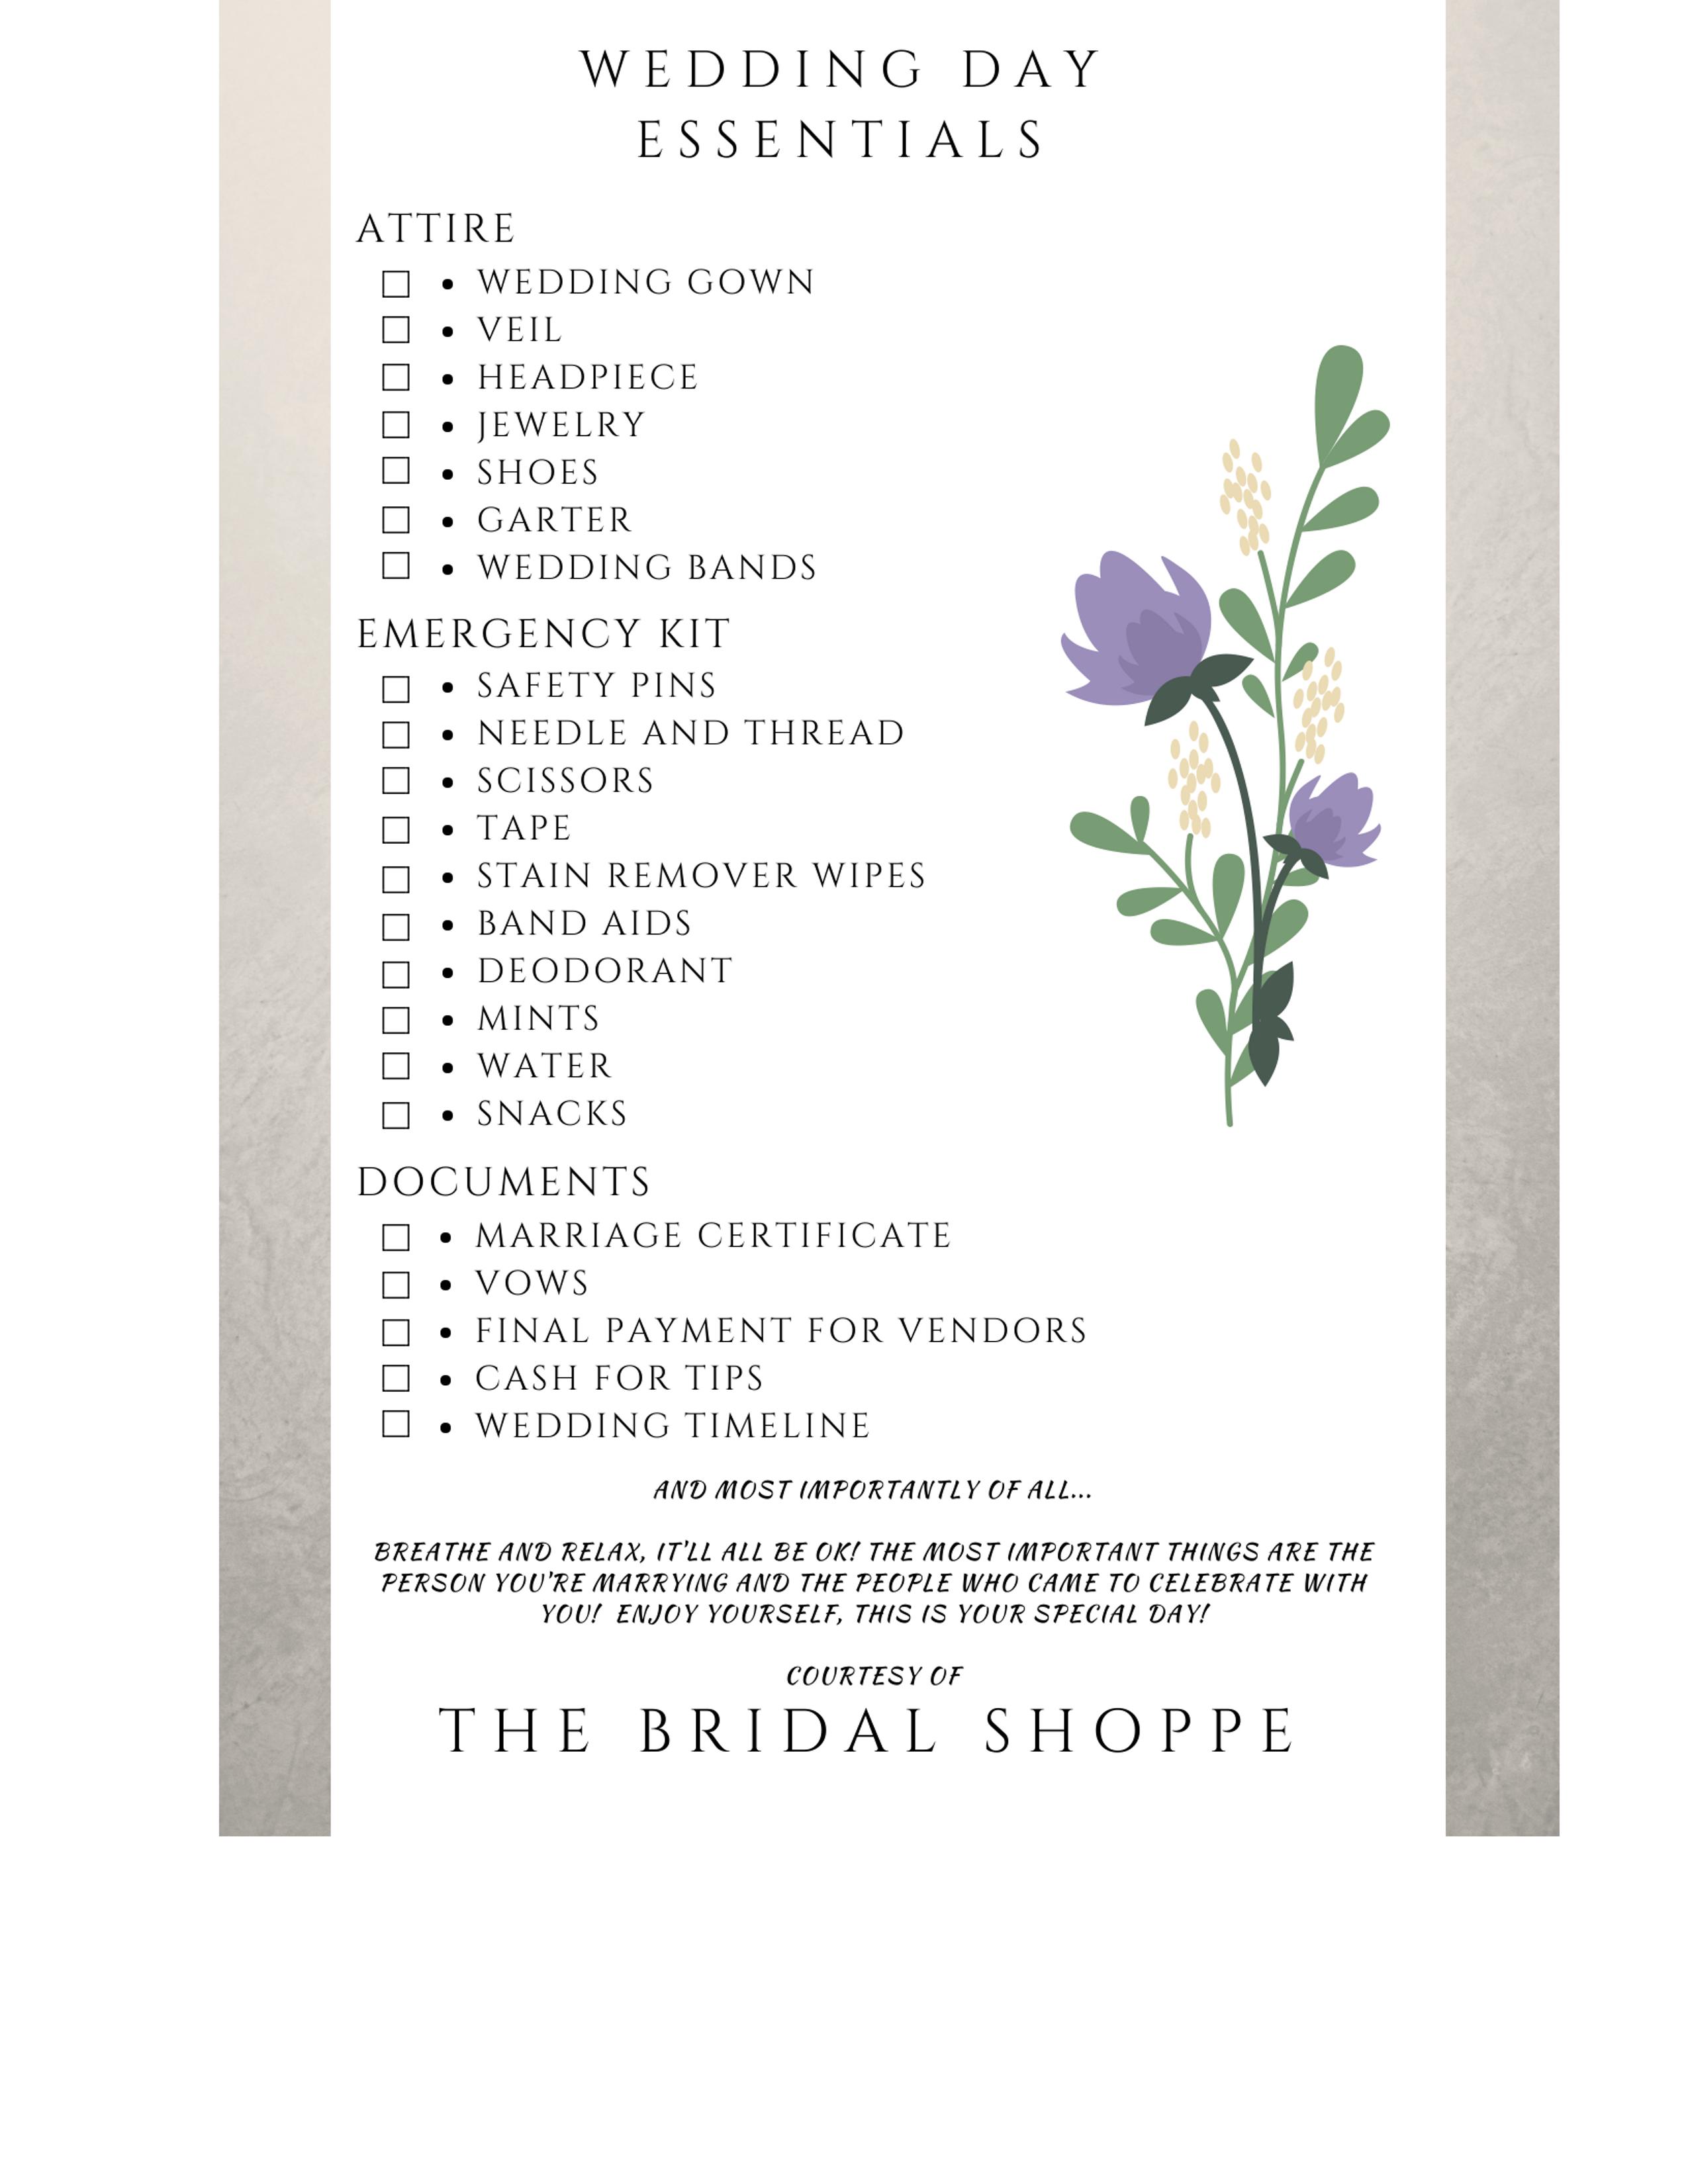 Wedding Day Checklist.Wedding Day Checklist The Bridal Shoppe